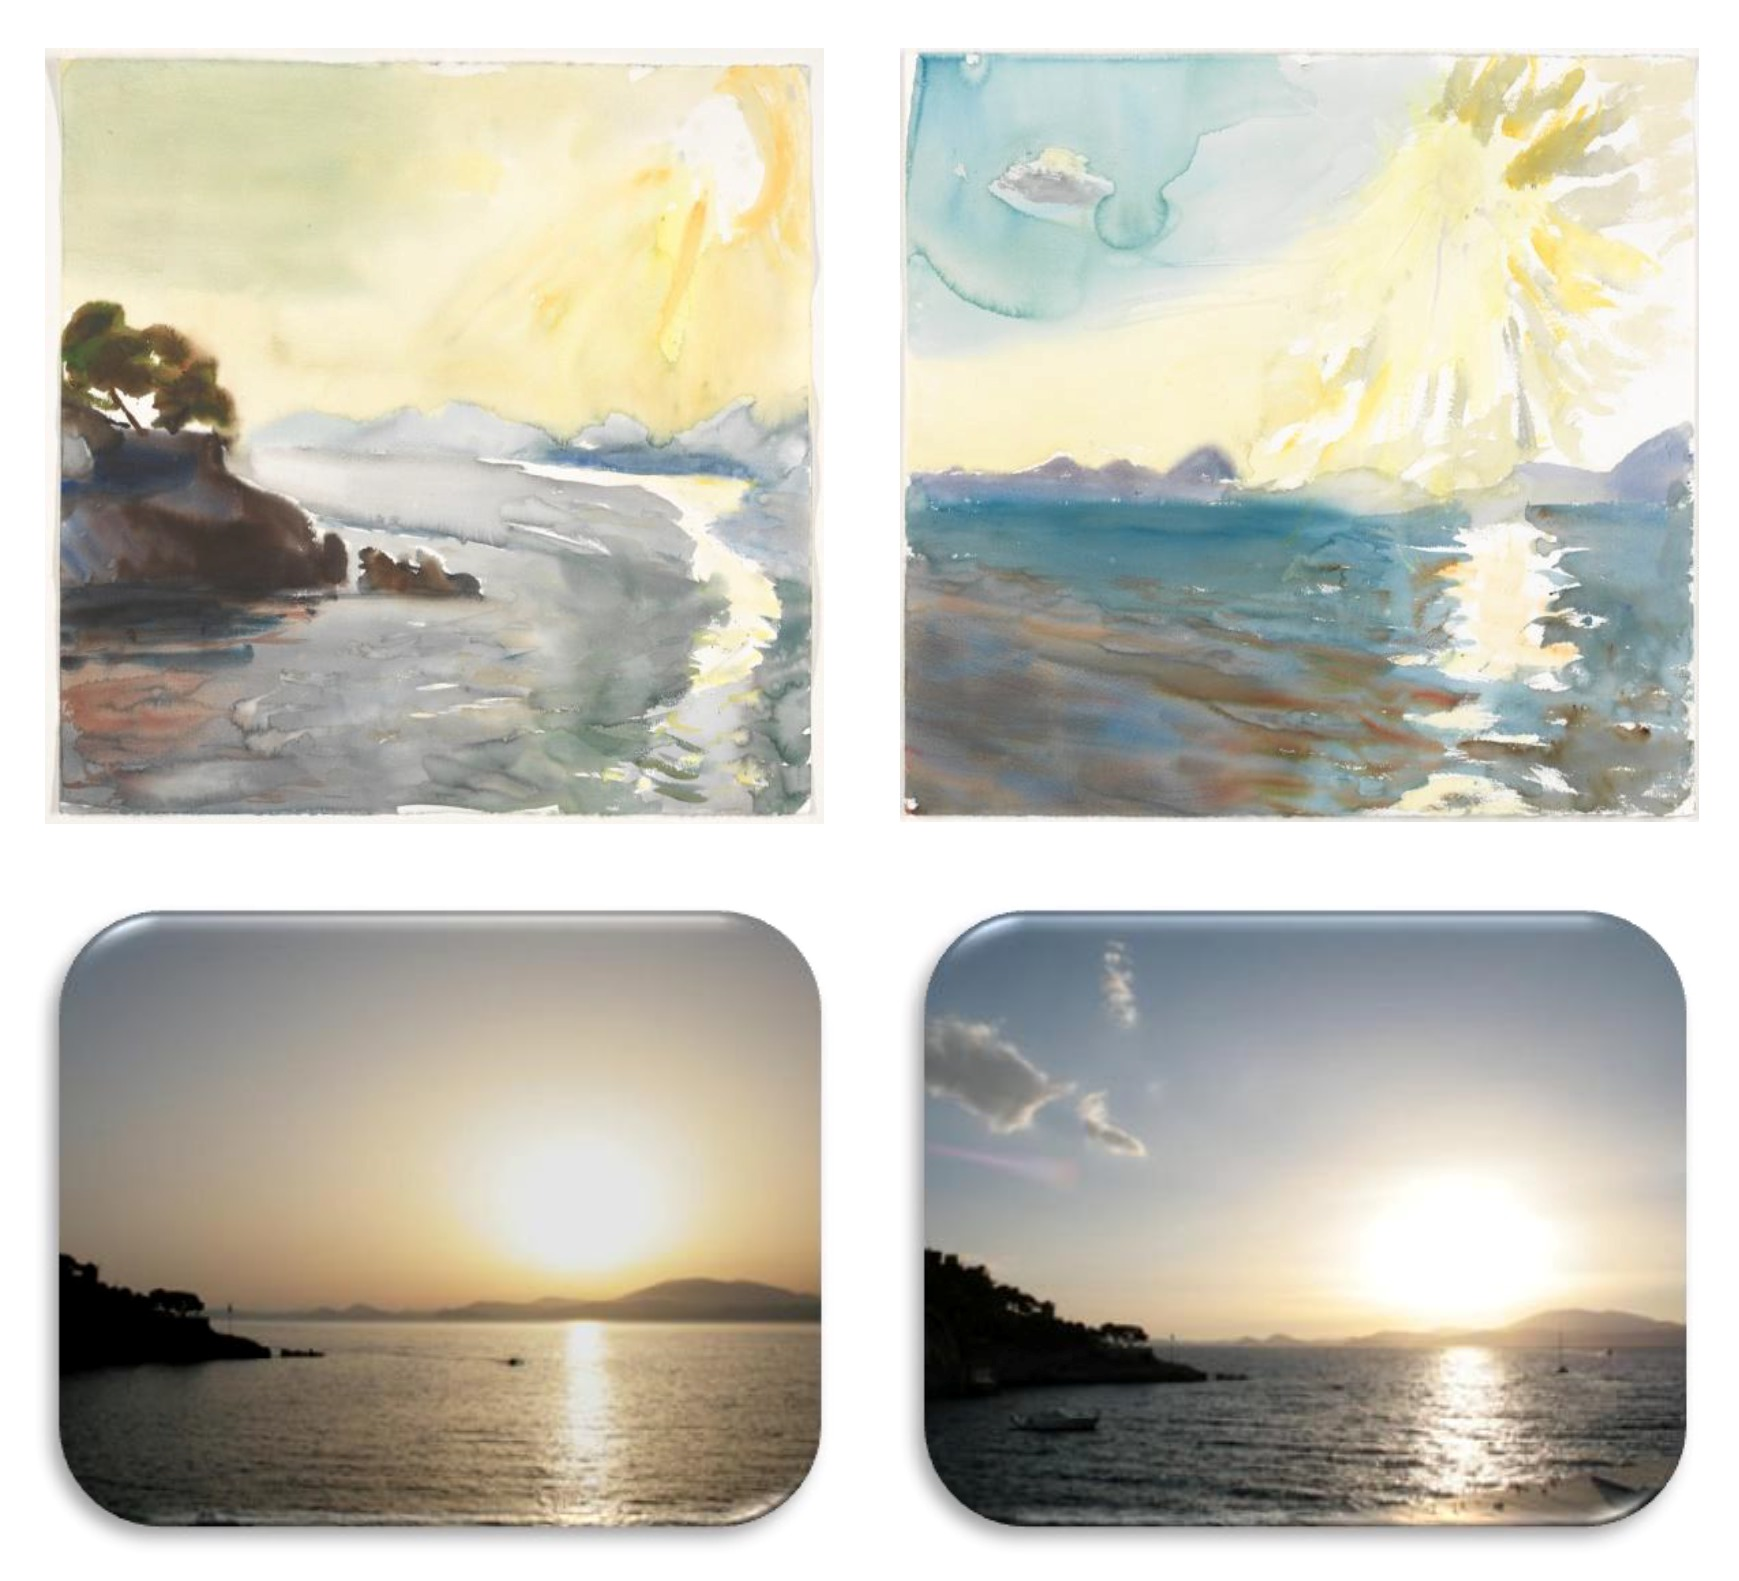 Tetsis paintings